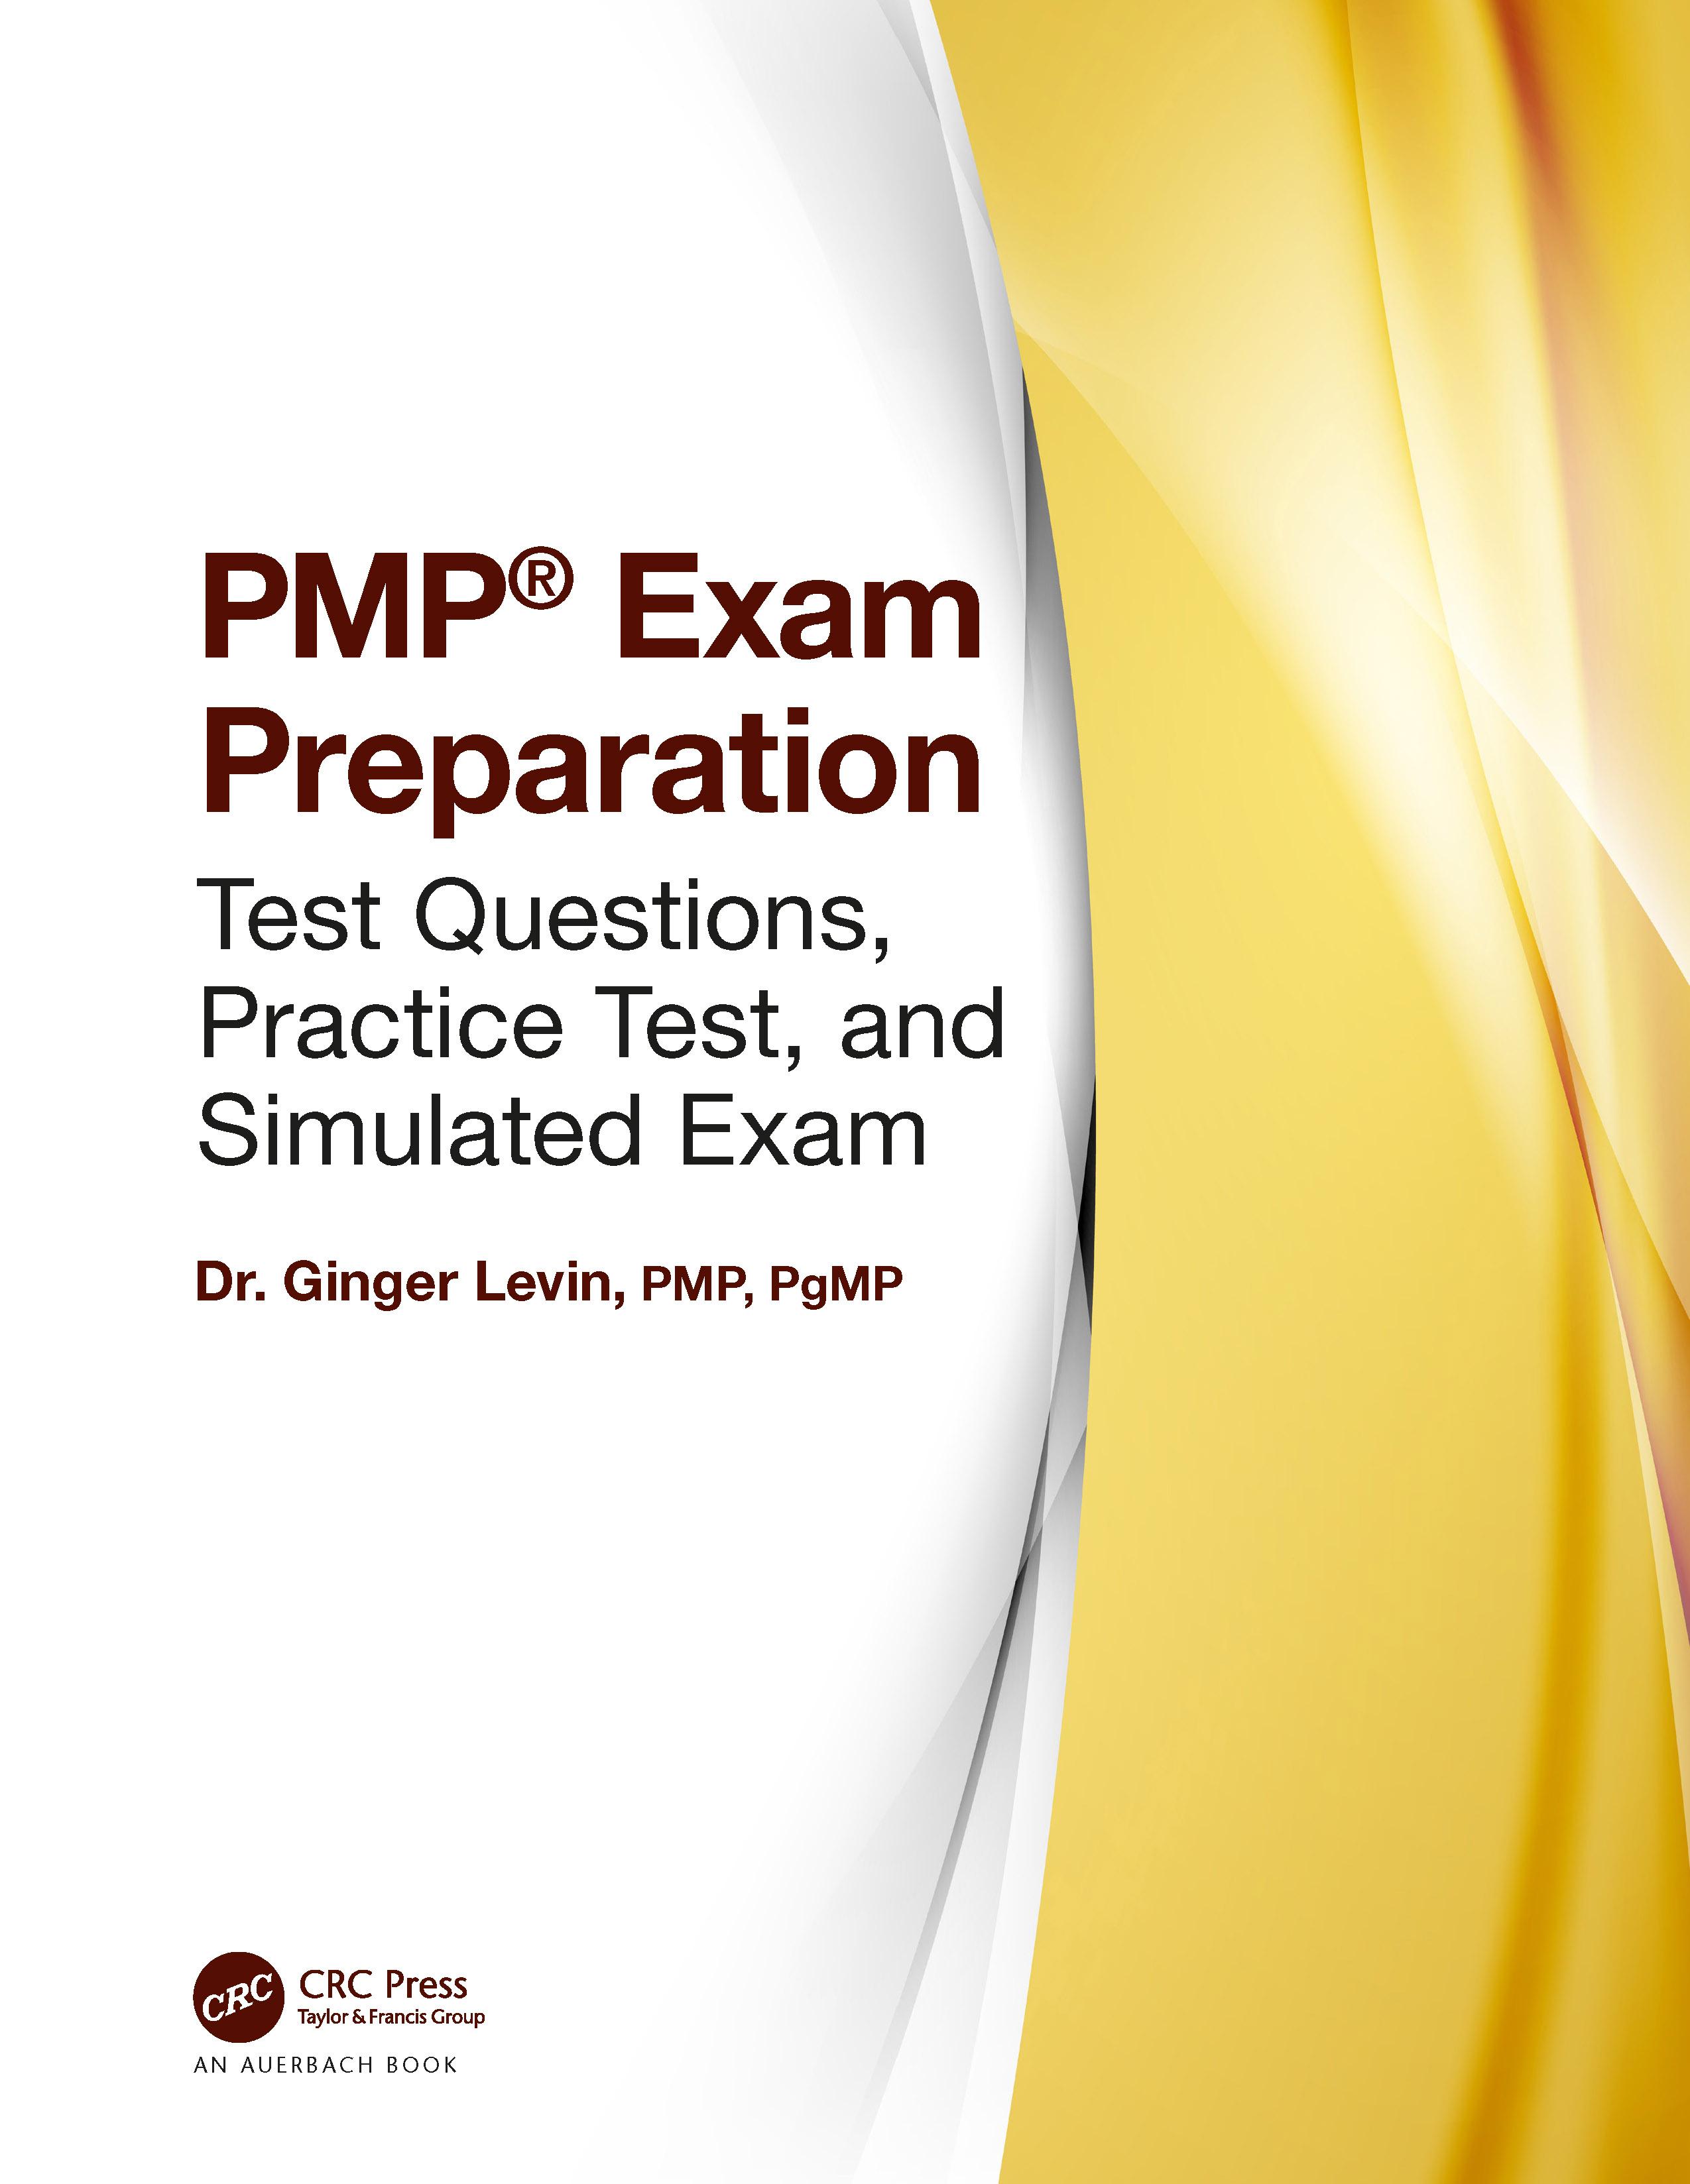 Download Ebook PMP® Exam Preparation by Levin, PMP, PgMP, Dr. Ginger Pdf